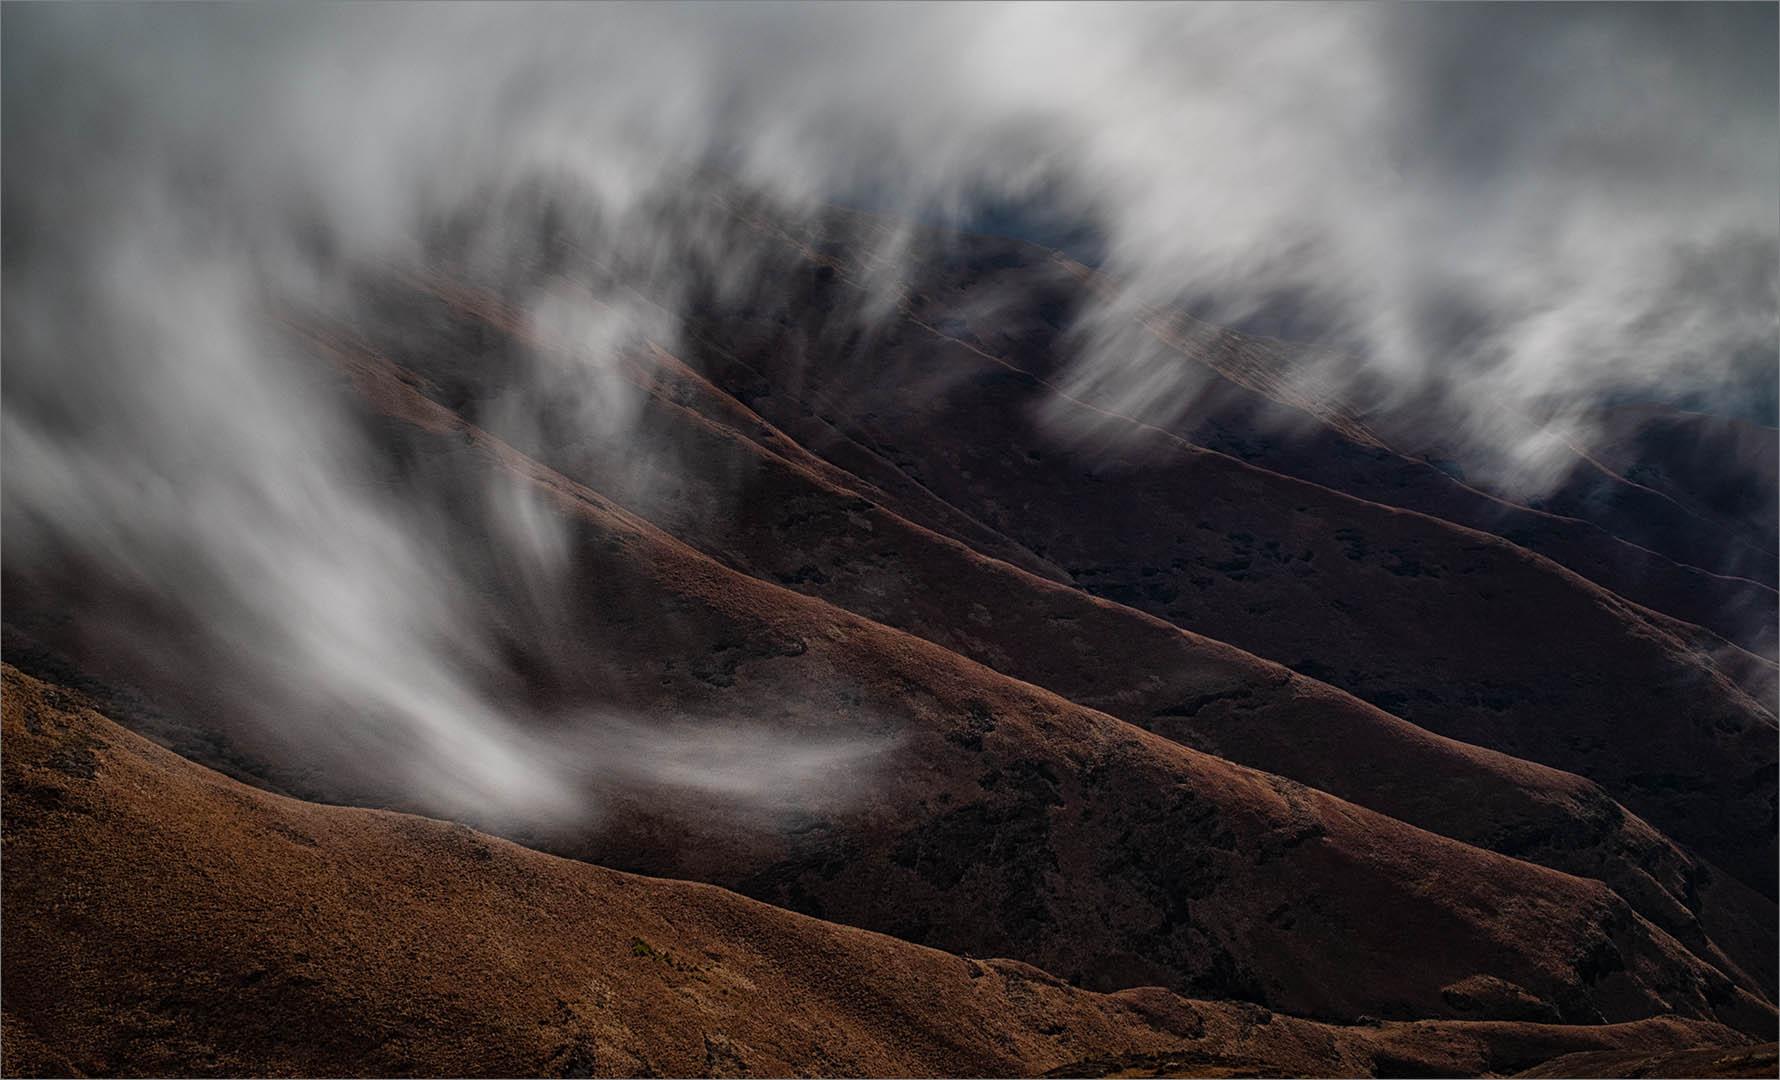 5_PI_Swirling clouds_Clare Appleyard